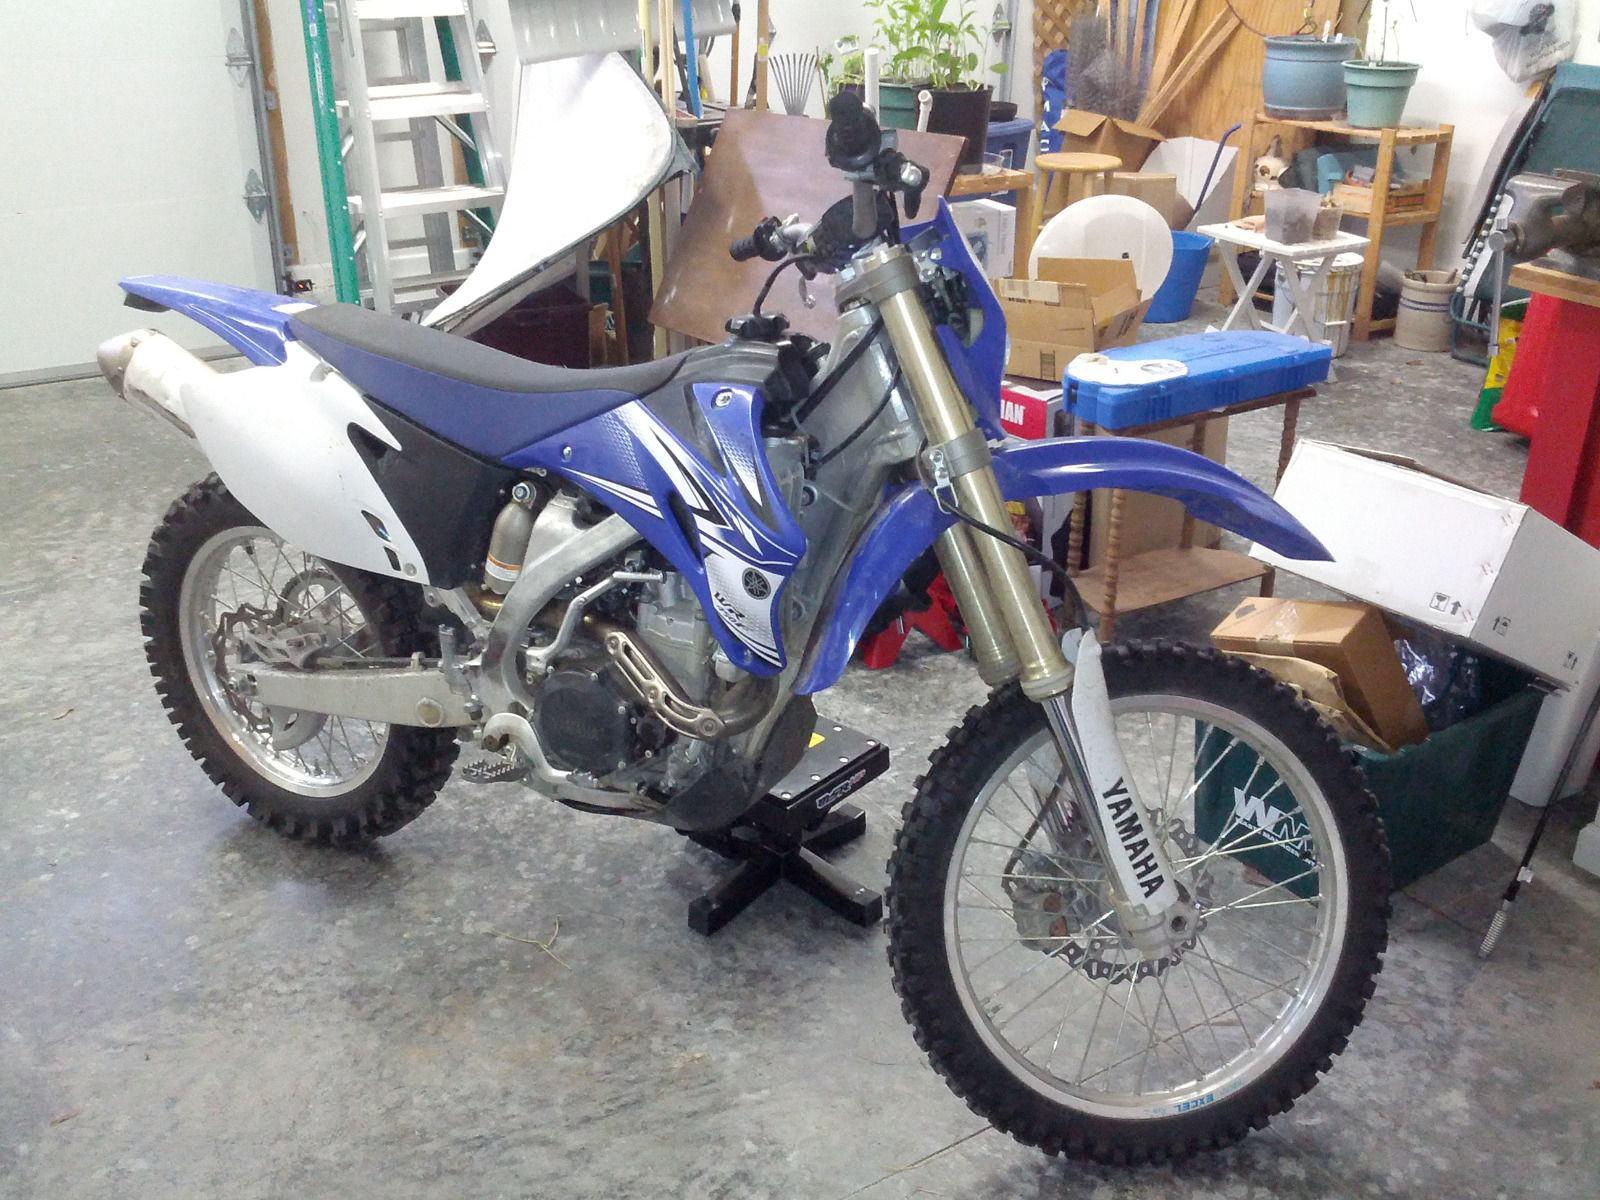 2011 yamaha wr450f dirtbike for sale for Yamaha 450 for sale